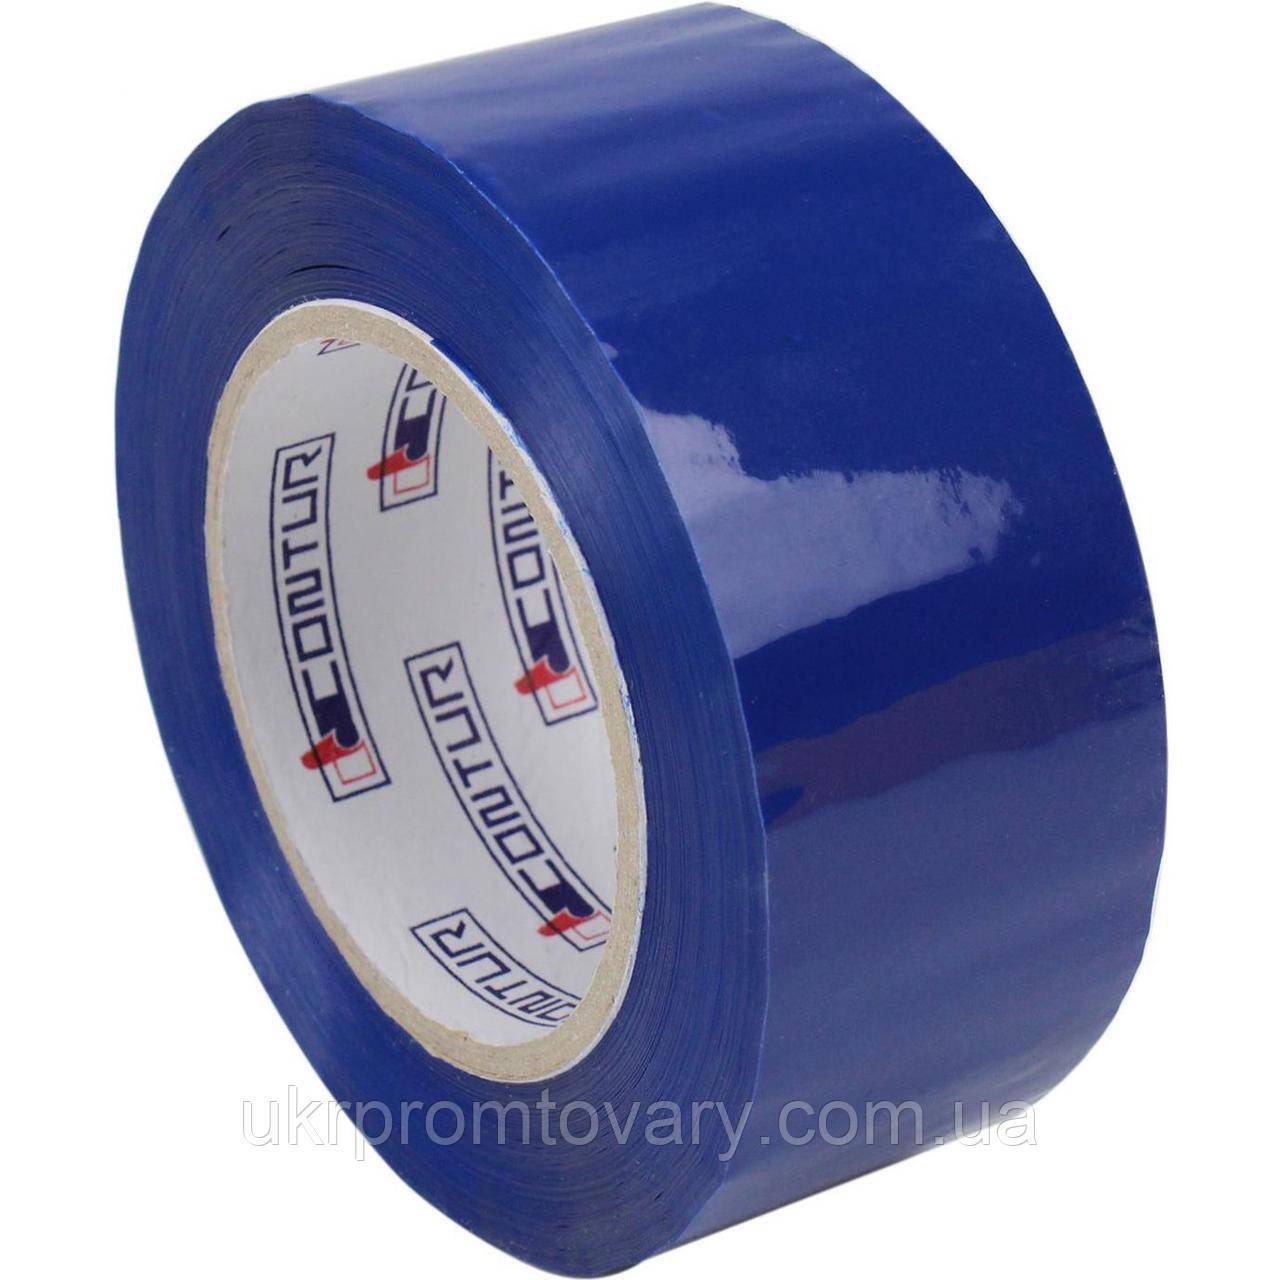 "Скотч ""Contur"" синий (200 м.), от производителя, опт розница"